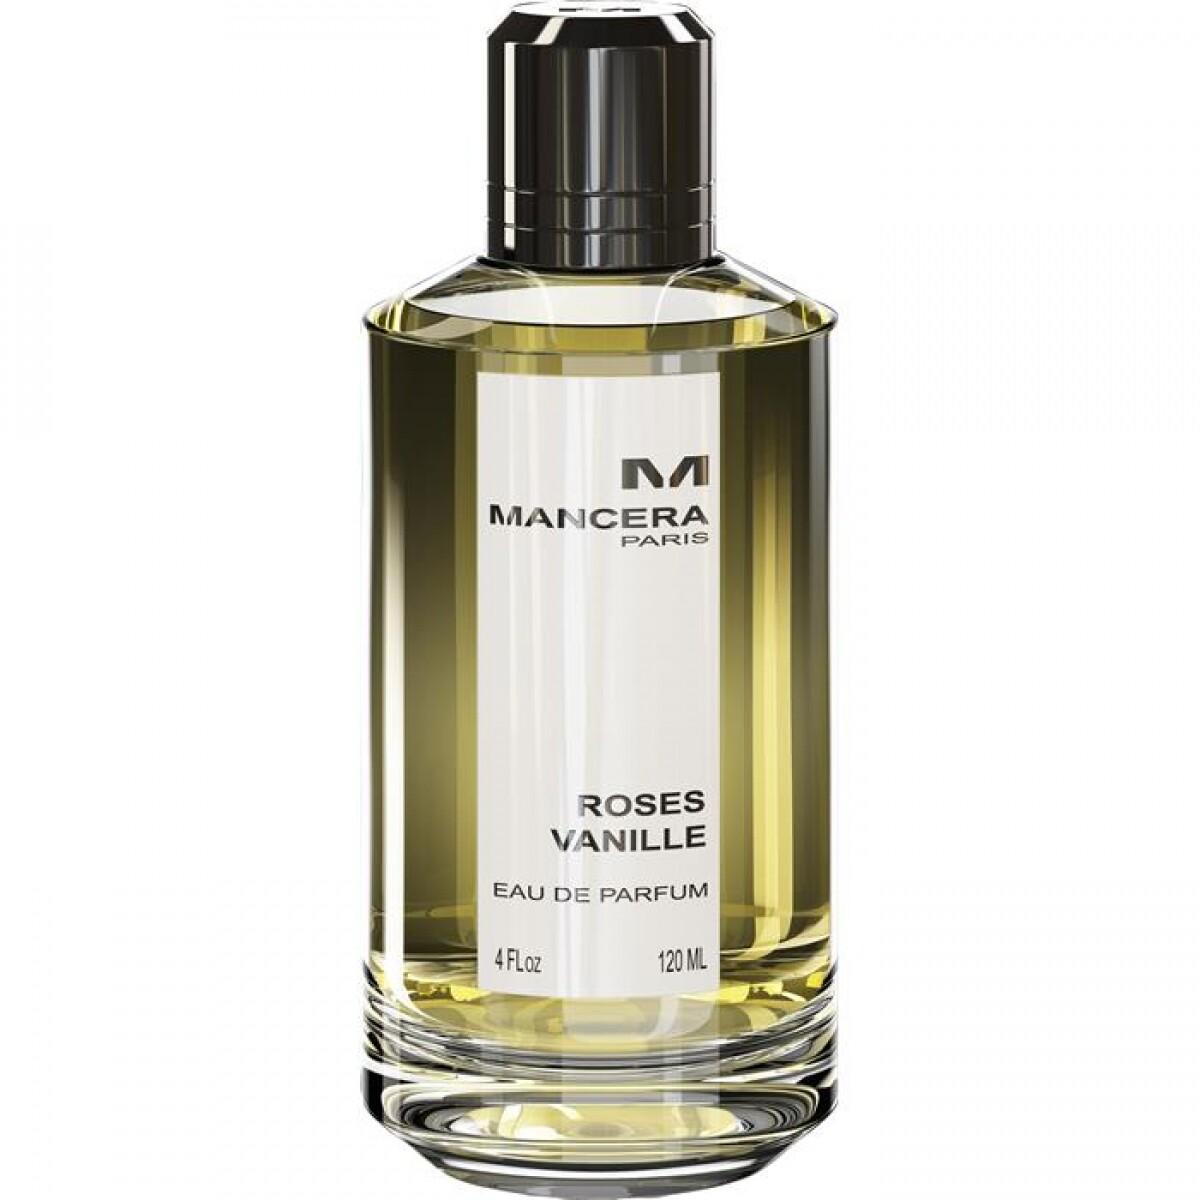 Mancera | Roses Vanilla 120ml | Parfum | 1228 diversen